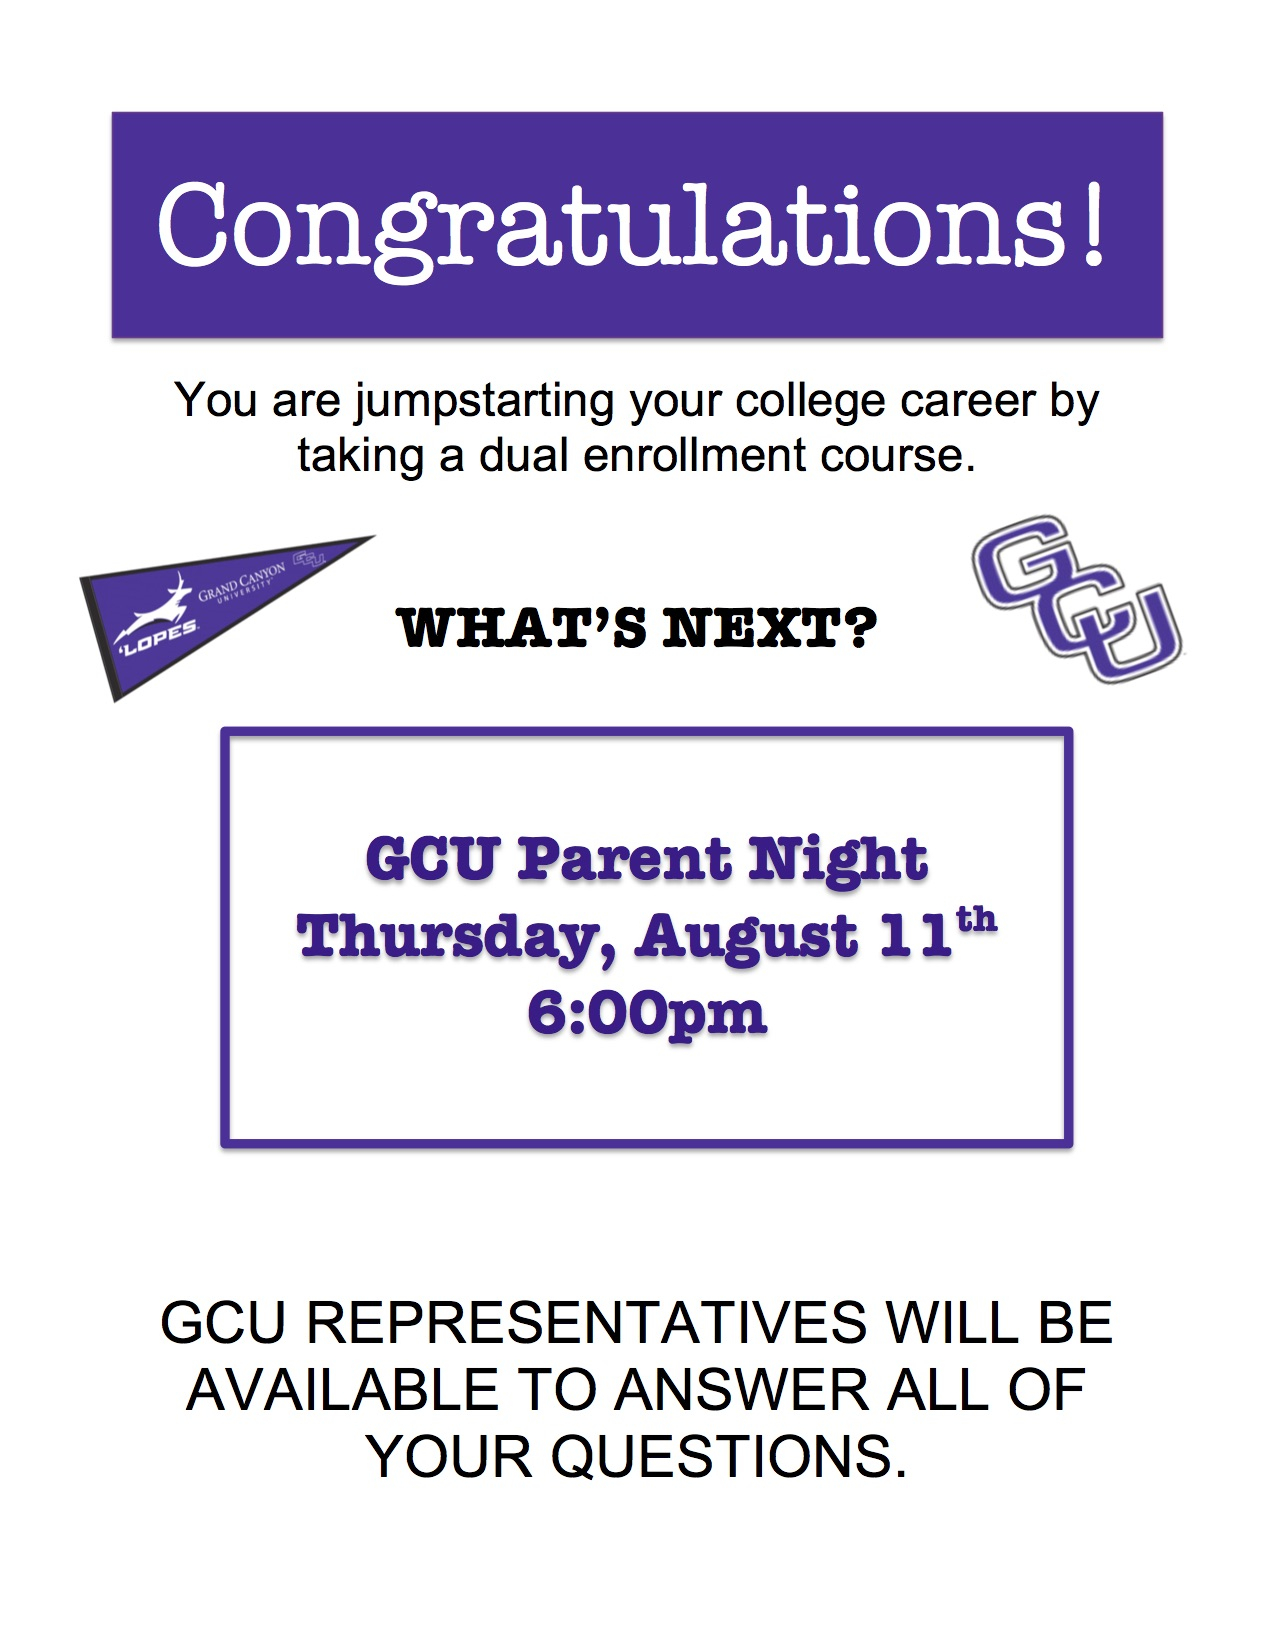 Gcu Parent Night Regarding Gcu Academic Calendar 2021 20